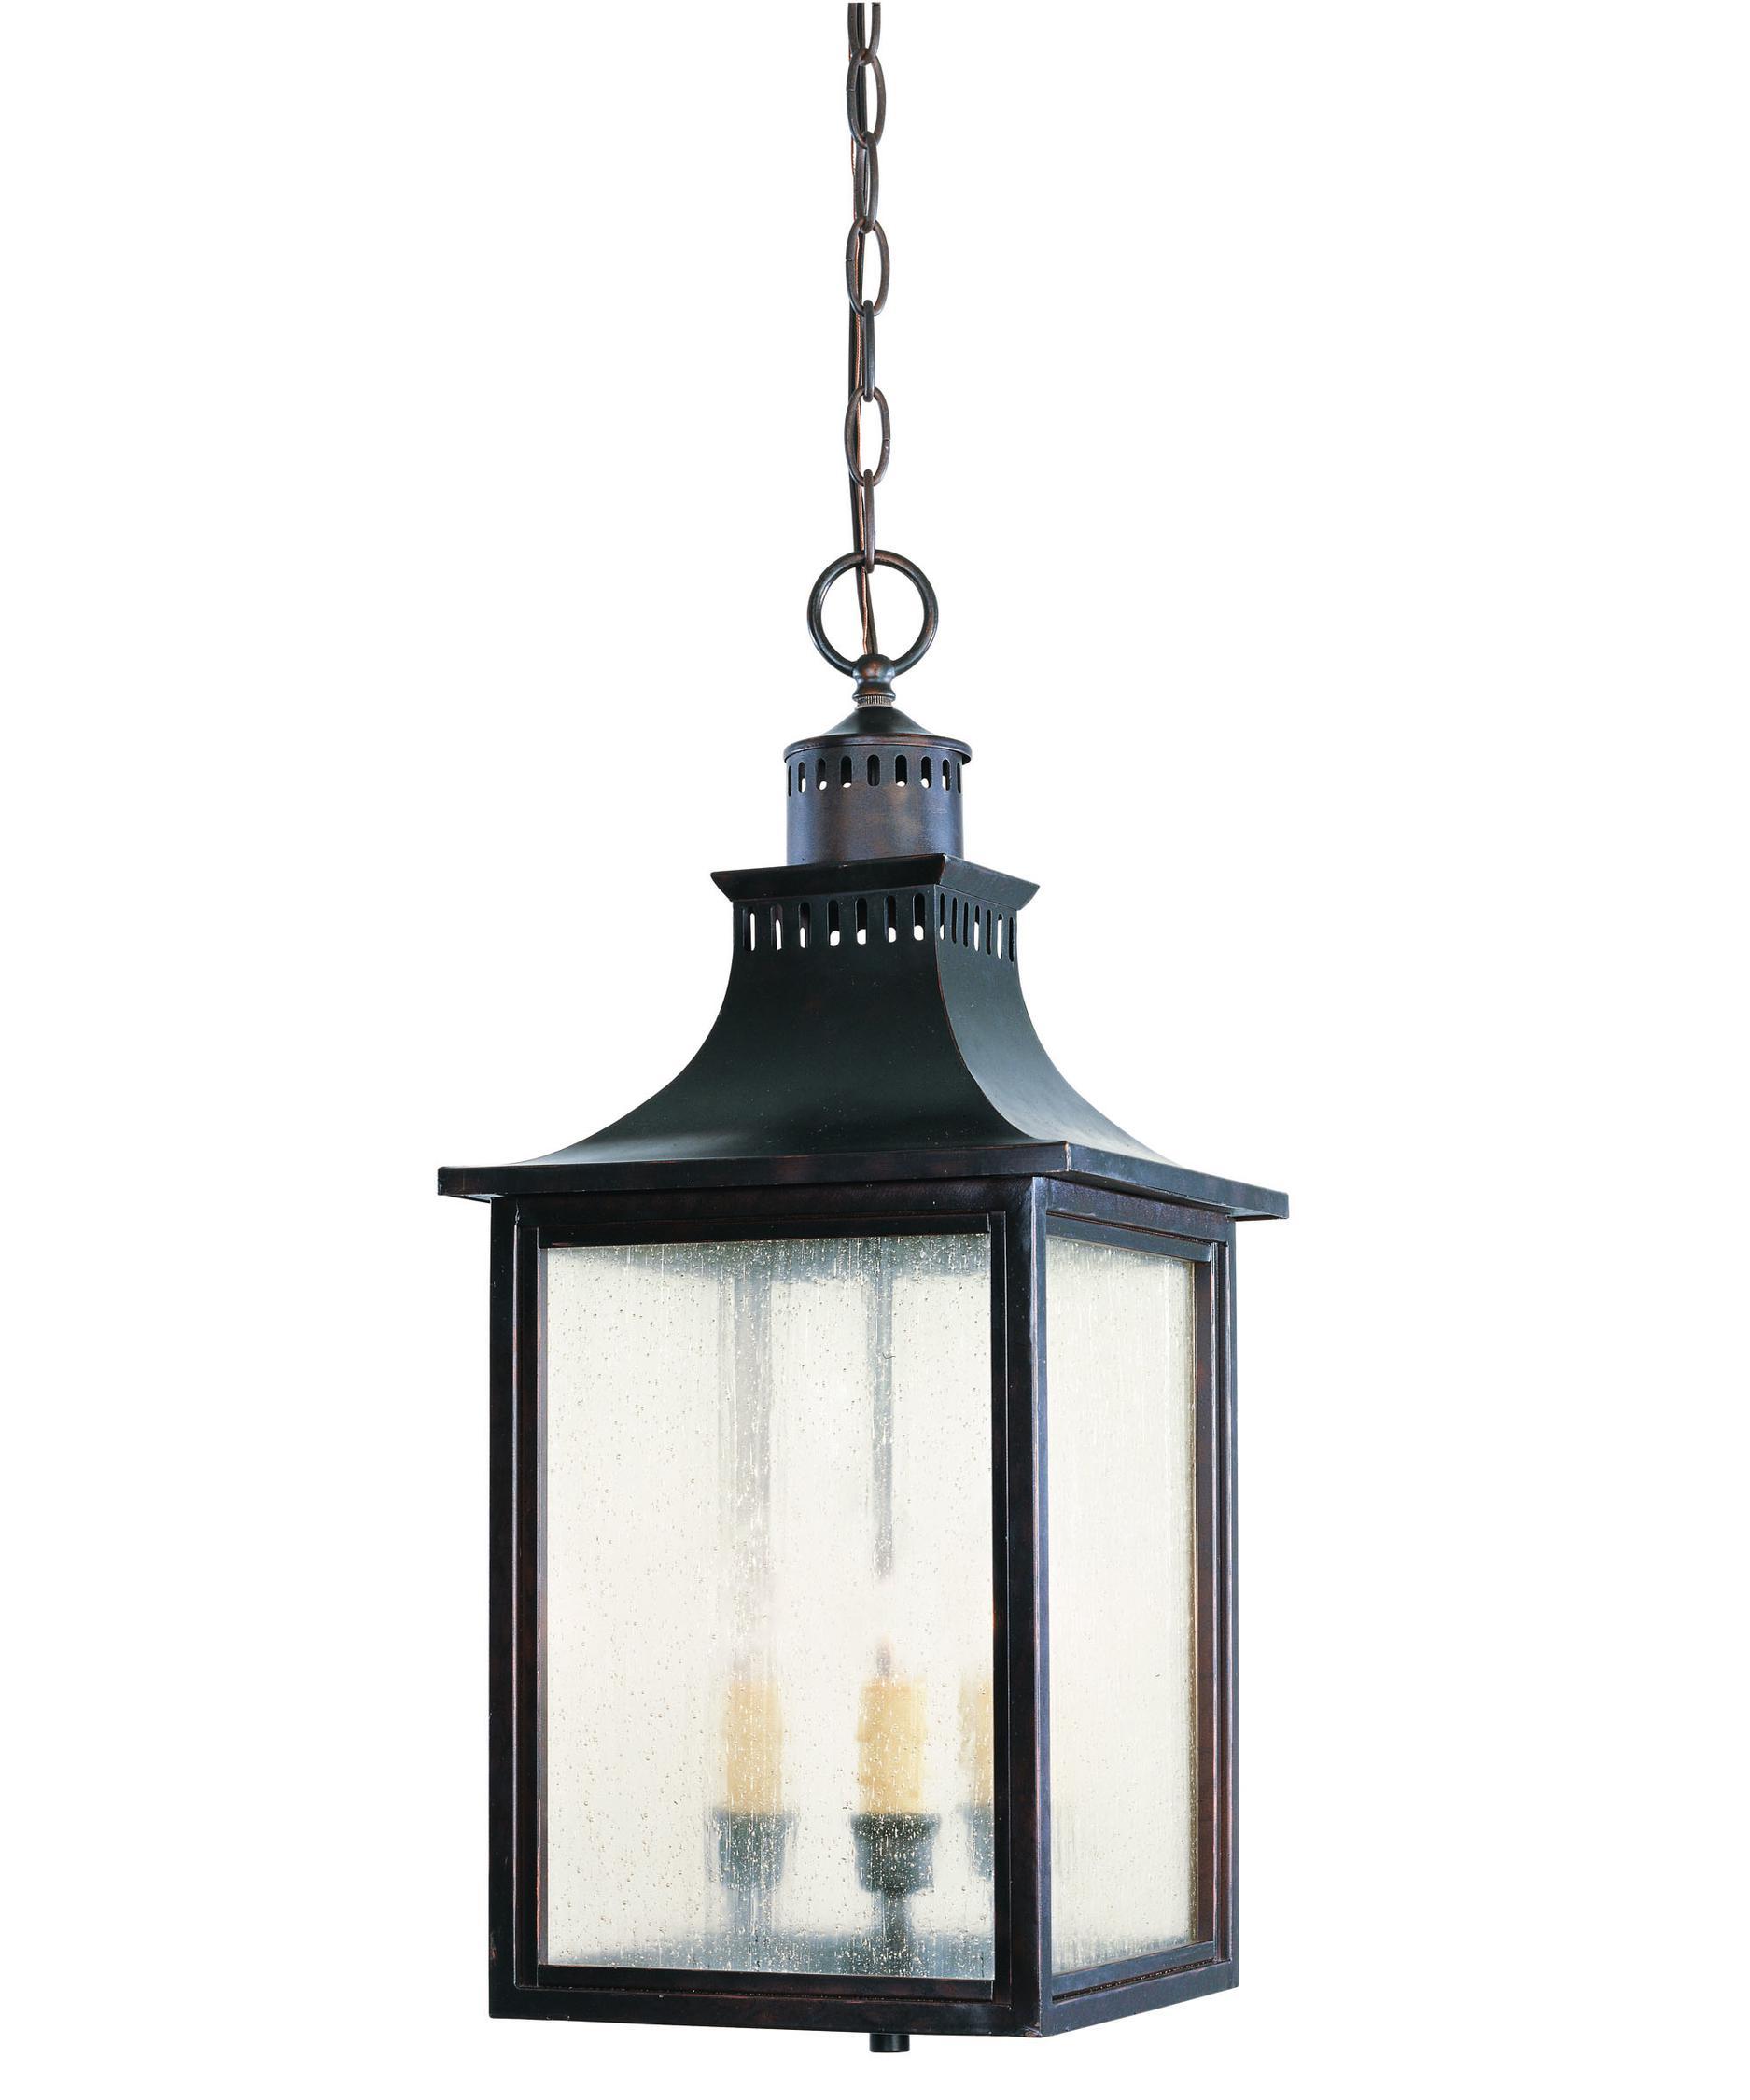 Outdoor hanging lighting - Savoy House 5 256 Monte Grande 10 Inch Wide 3 Light Outdoor Hanging Lantern Capitol Lighting 1 800lighting Com